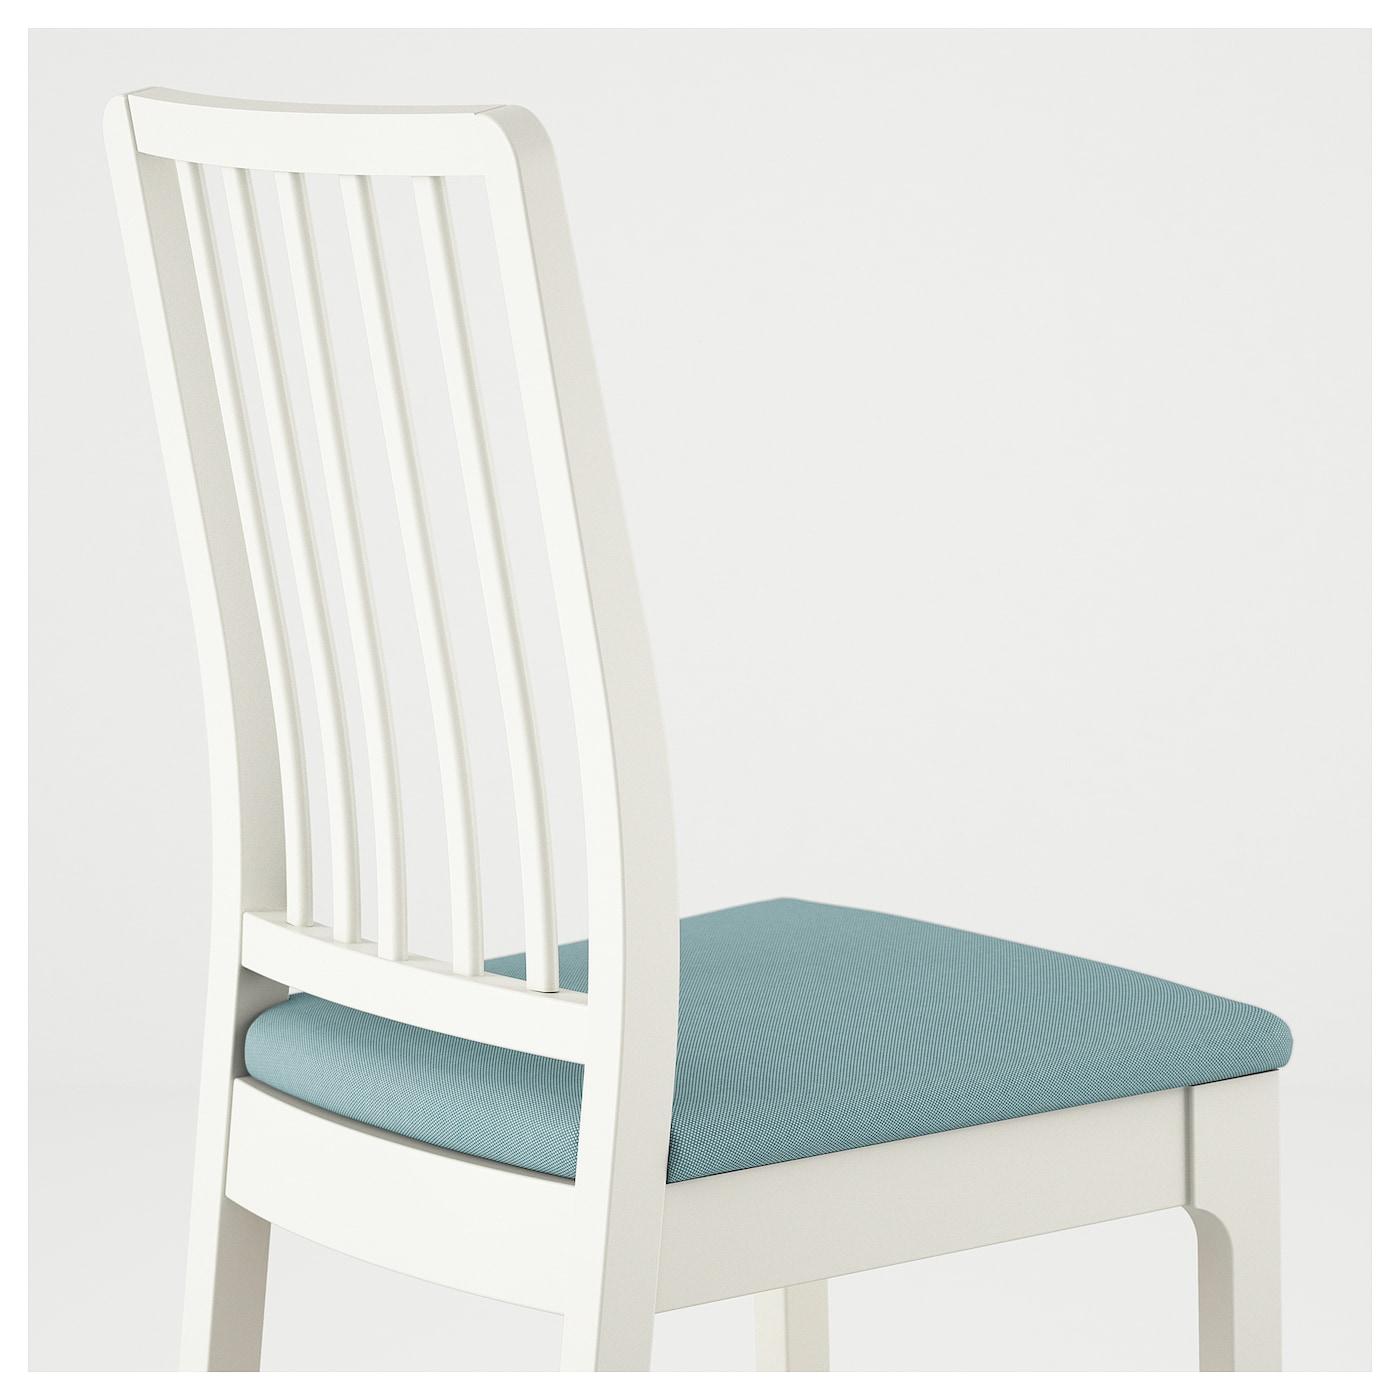 Ekedalen chaise blanc orrsta bleu clair ikea for Housse chaises ikea